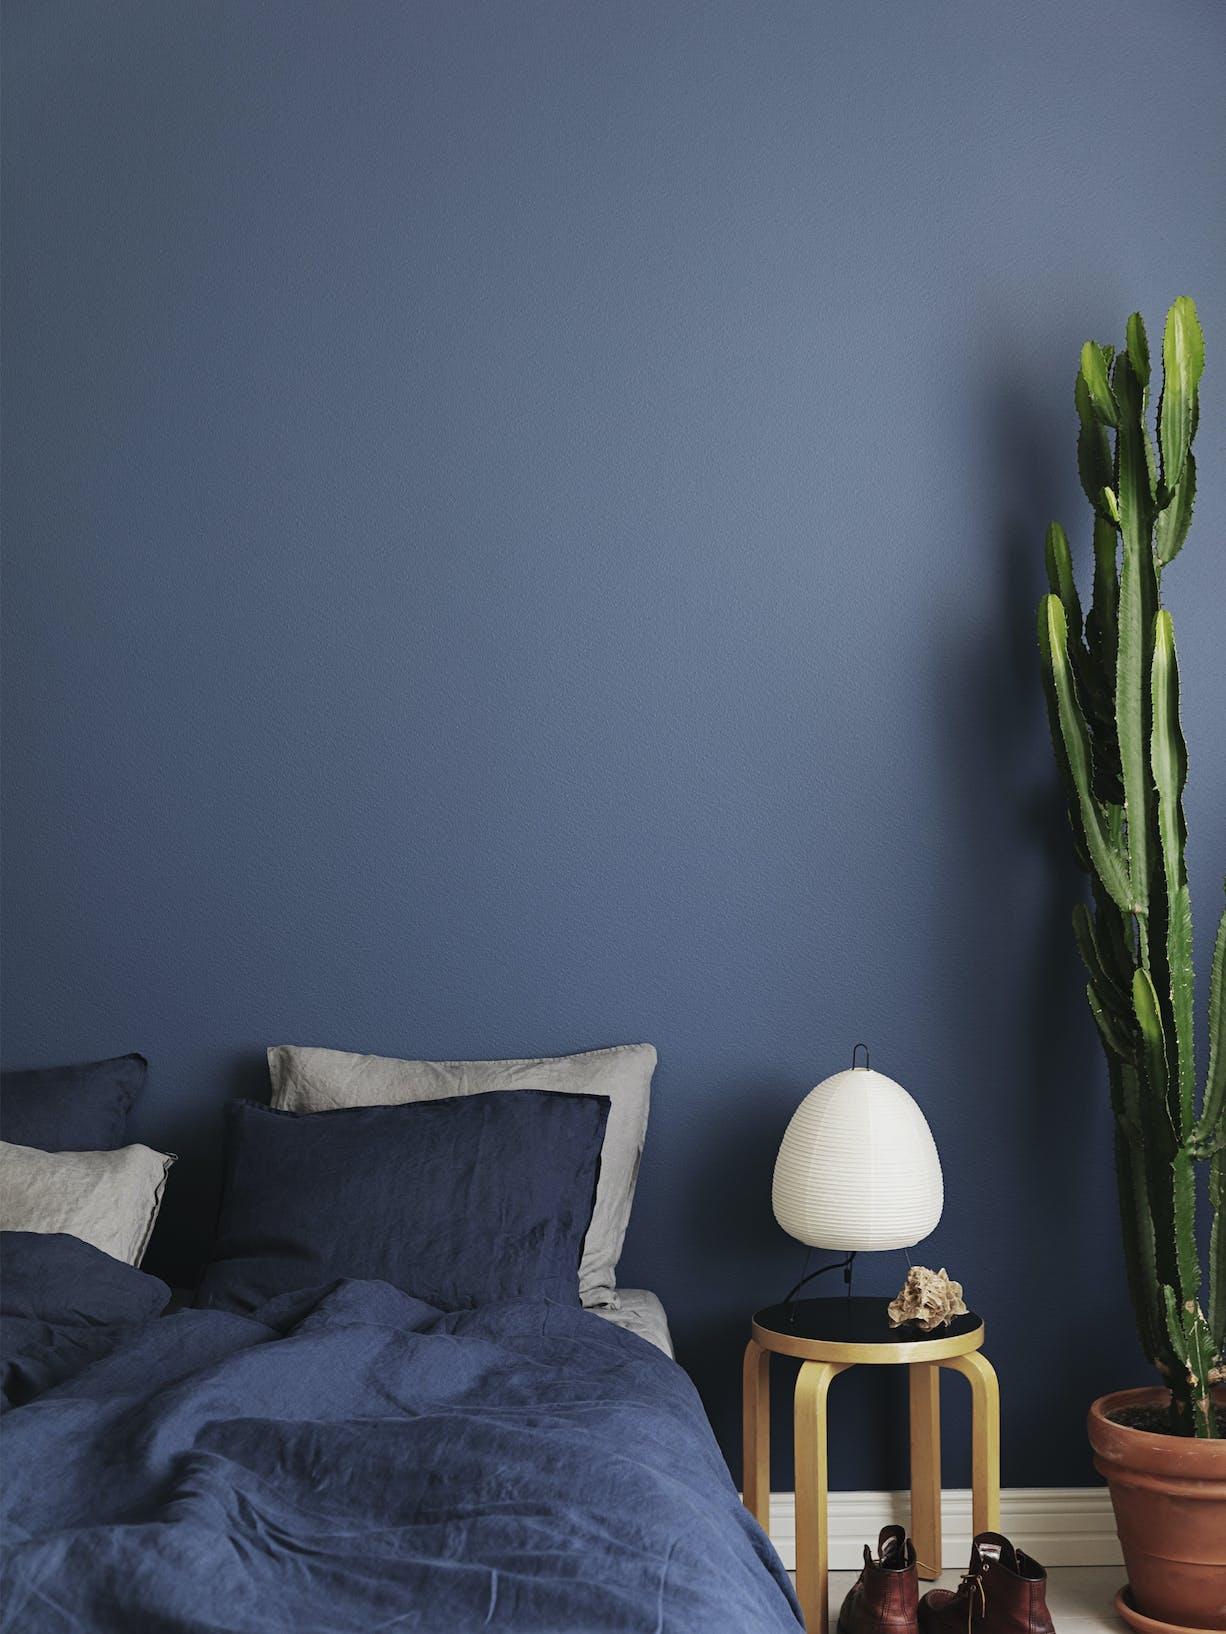 Interior Colour Mood - Calming Blue - Indigo L429 - Left Image